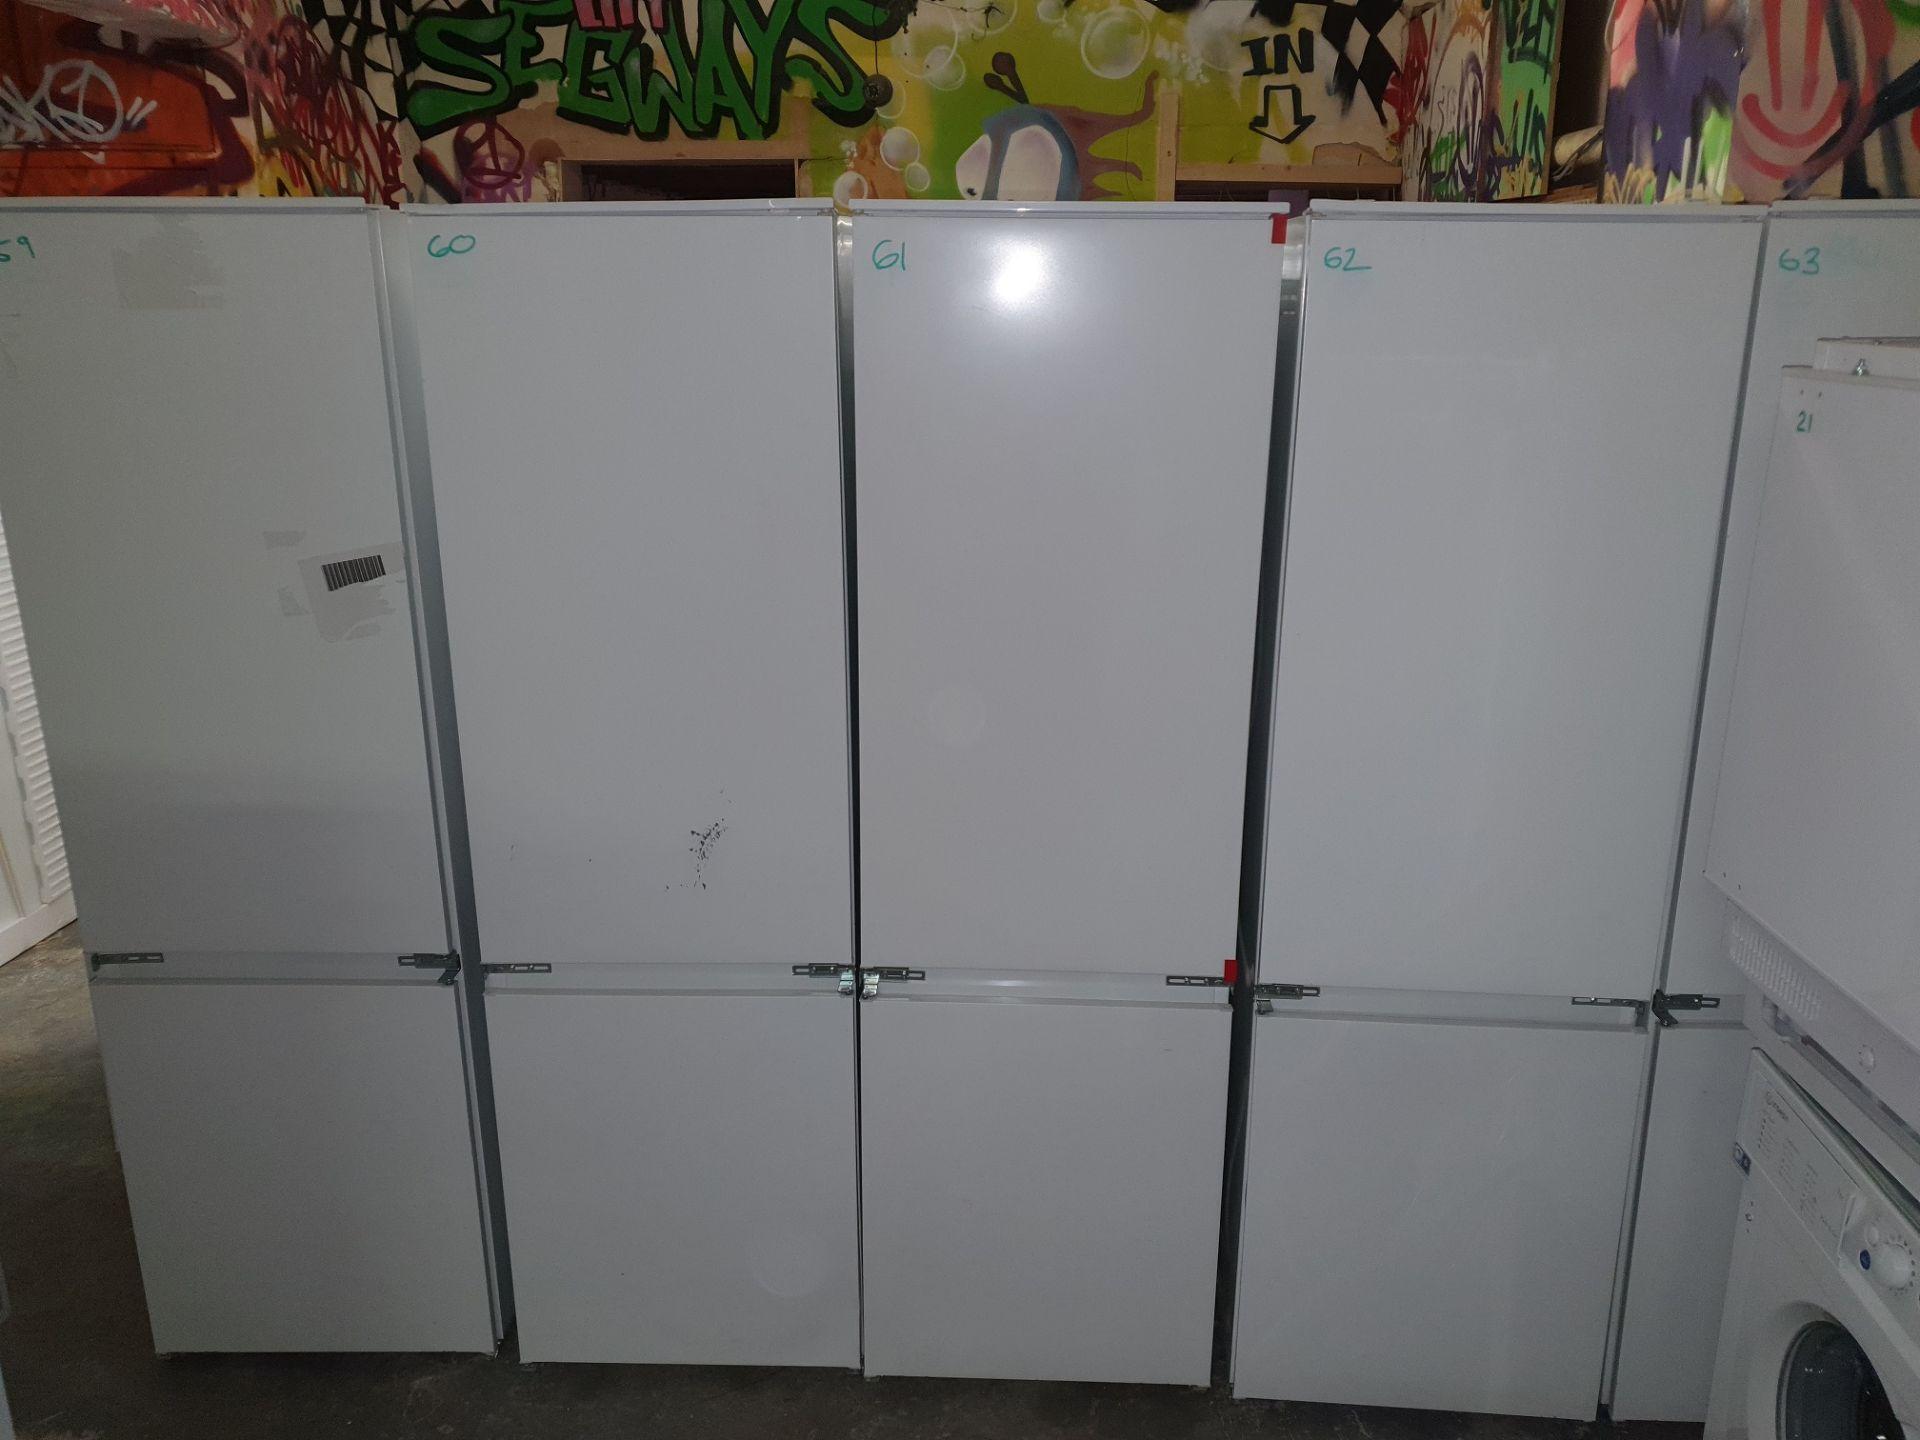 NEW/GRADED AND PACKAGED Zanussi ZBB28441SV Integrated 70/30 Fridge Freezer (Slight external damage) - Image 2 of 14